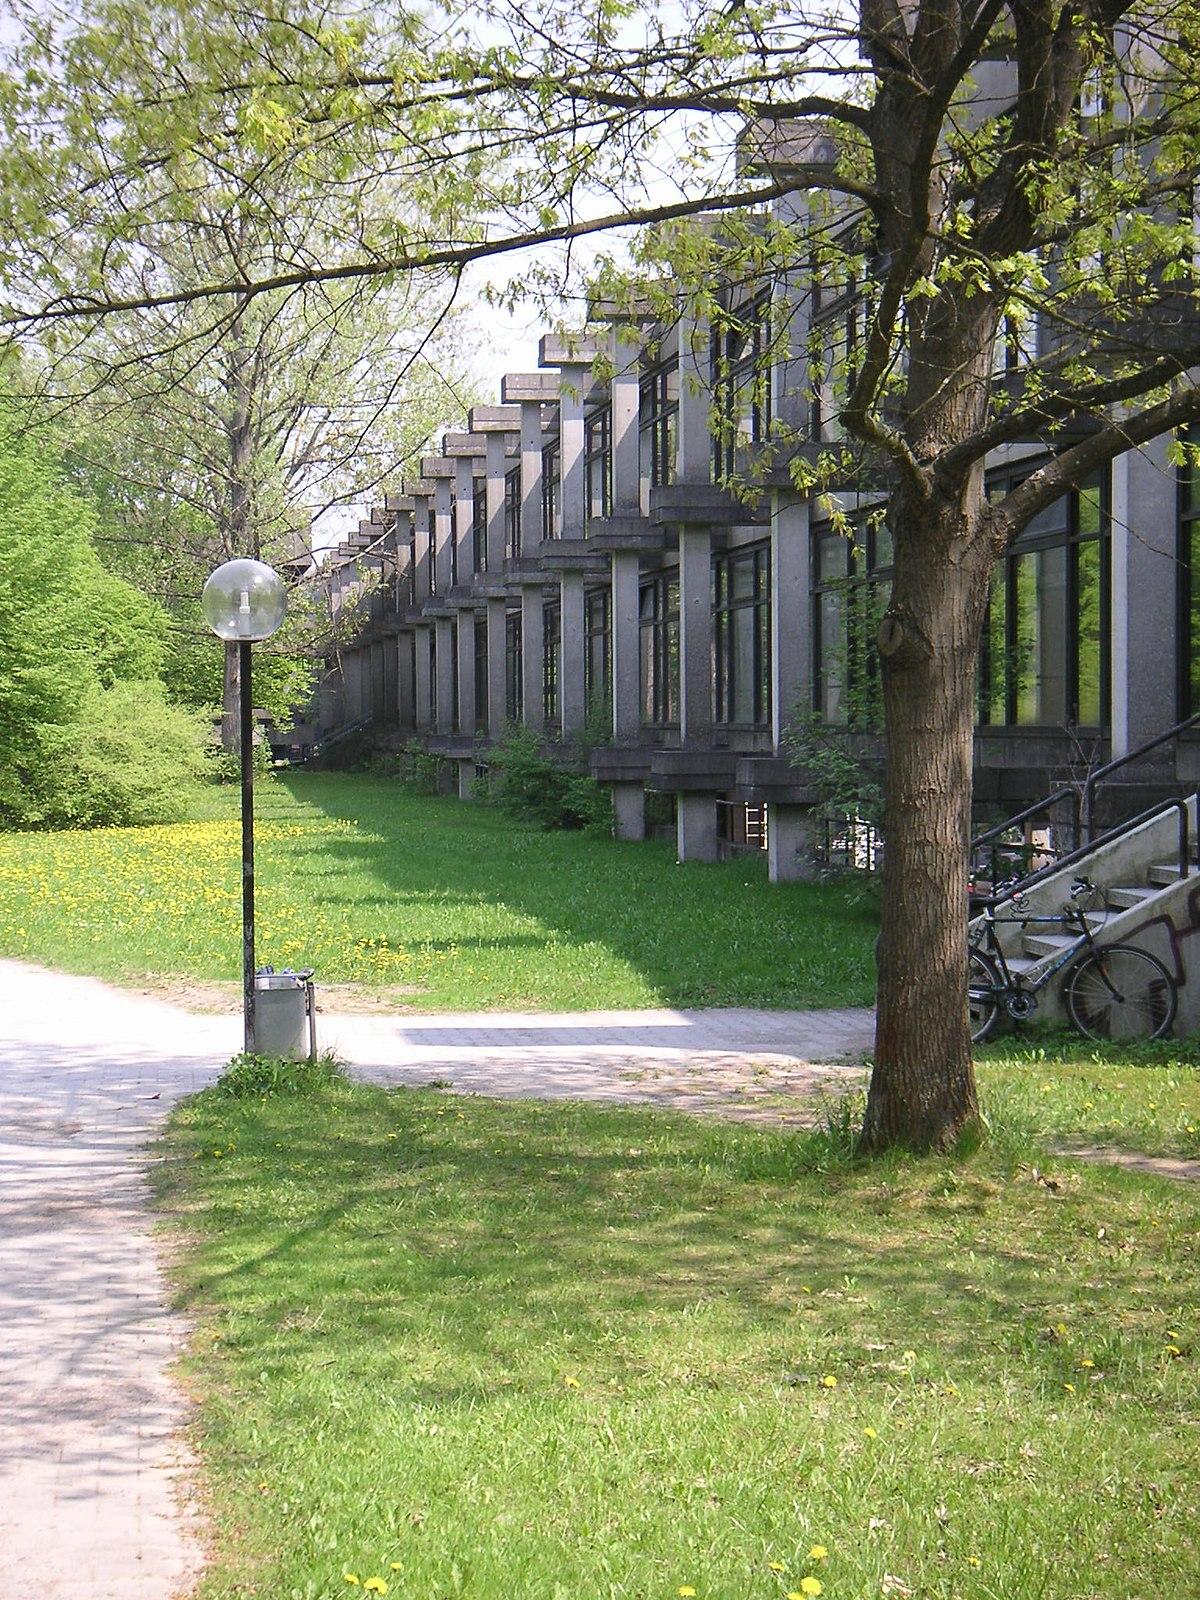 Universidad de ratisbona wikipedia la enciclopedia libre for Uni architektur